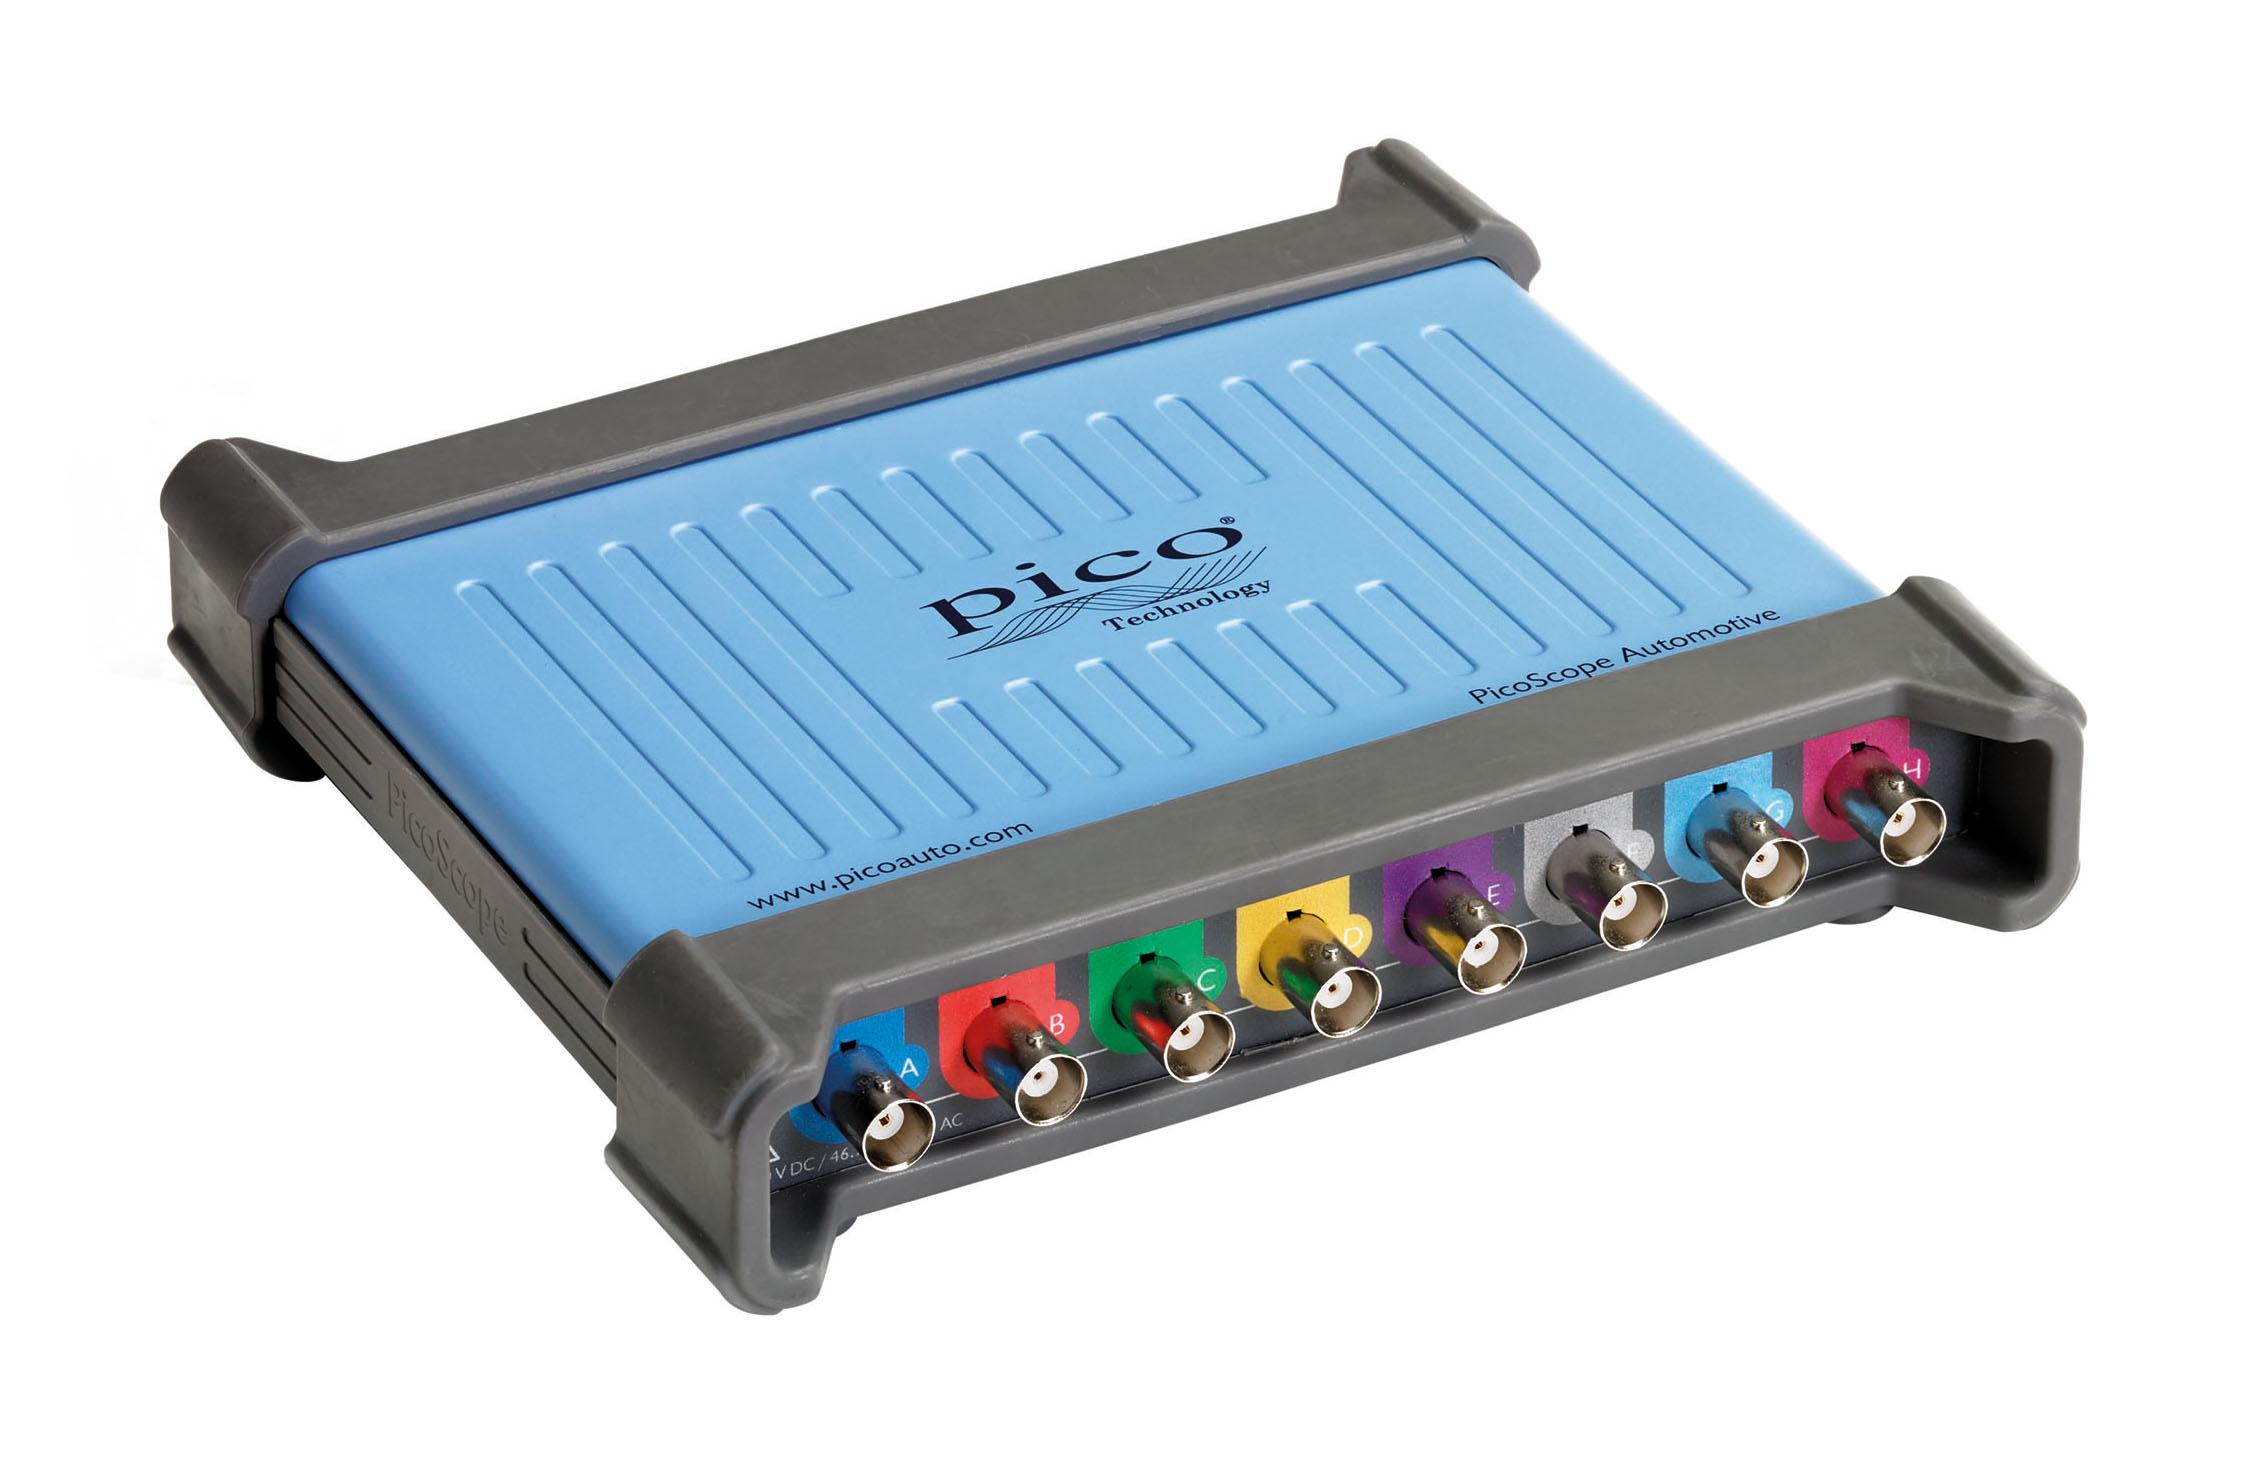 PicoScope 4823 8-Channel Automotive Oscilloscope has USB 3.0